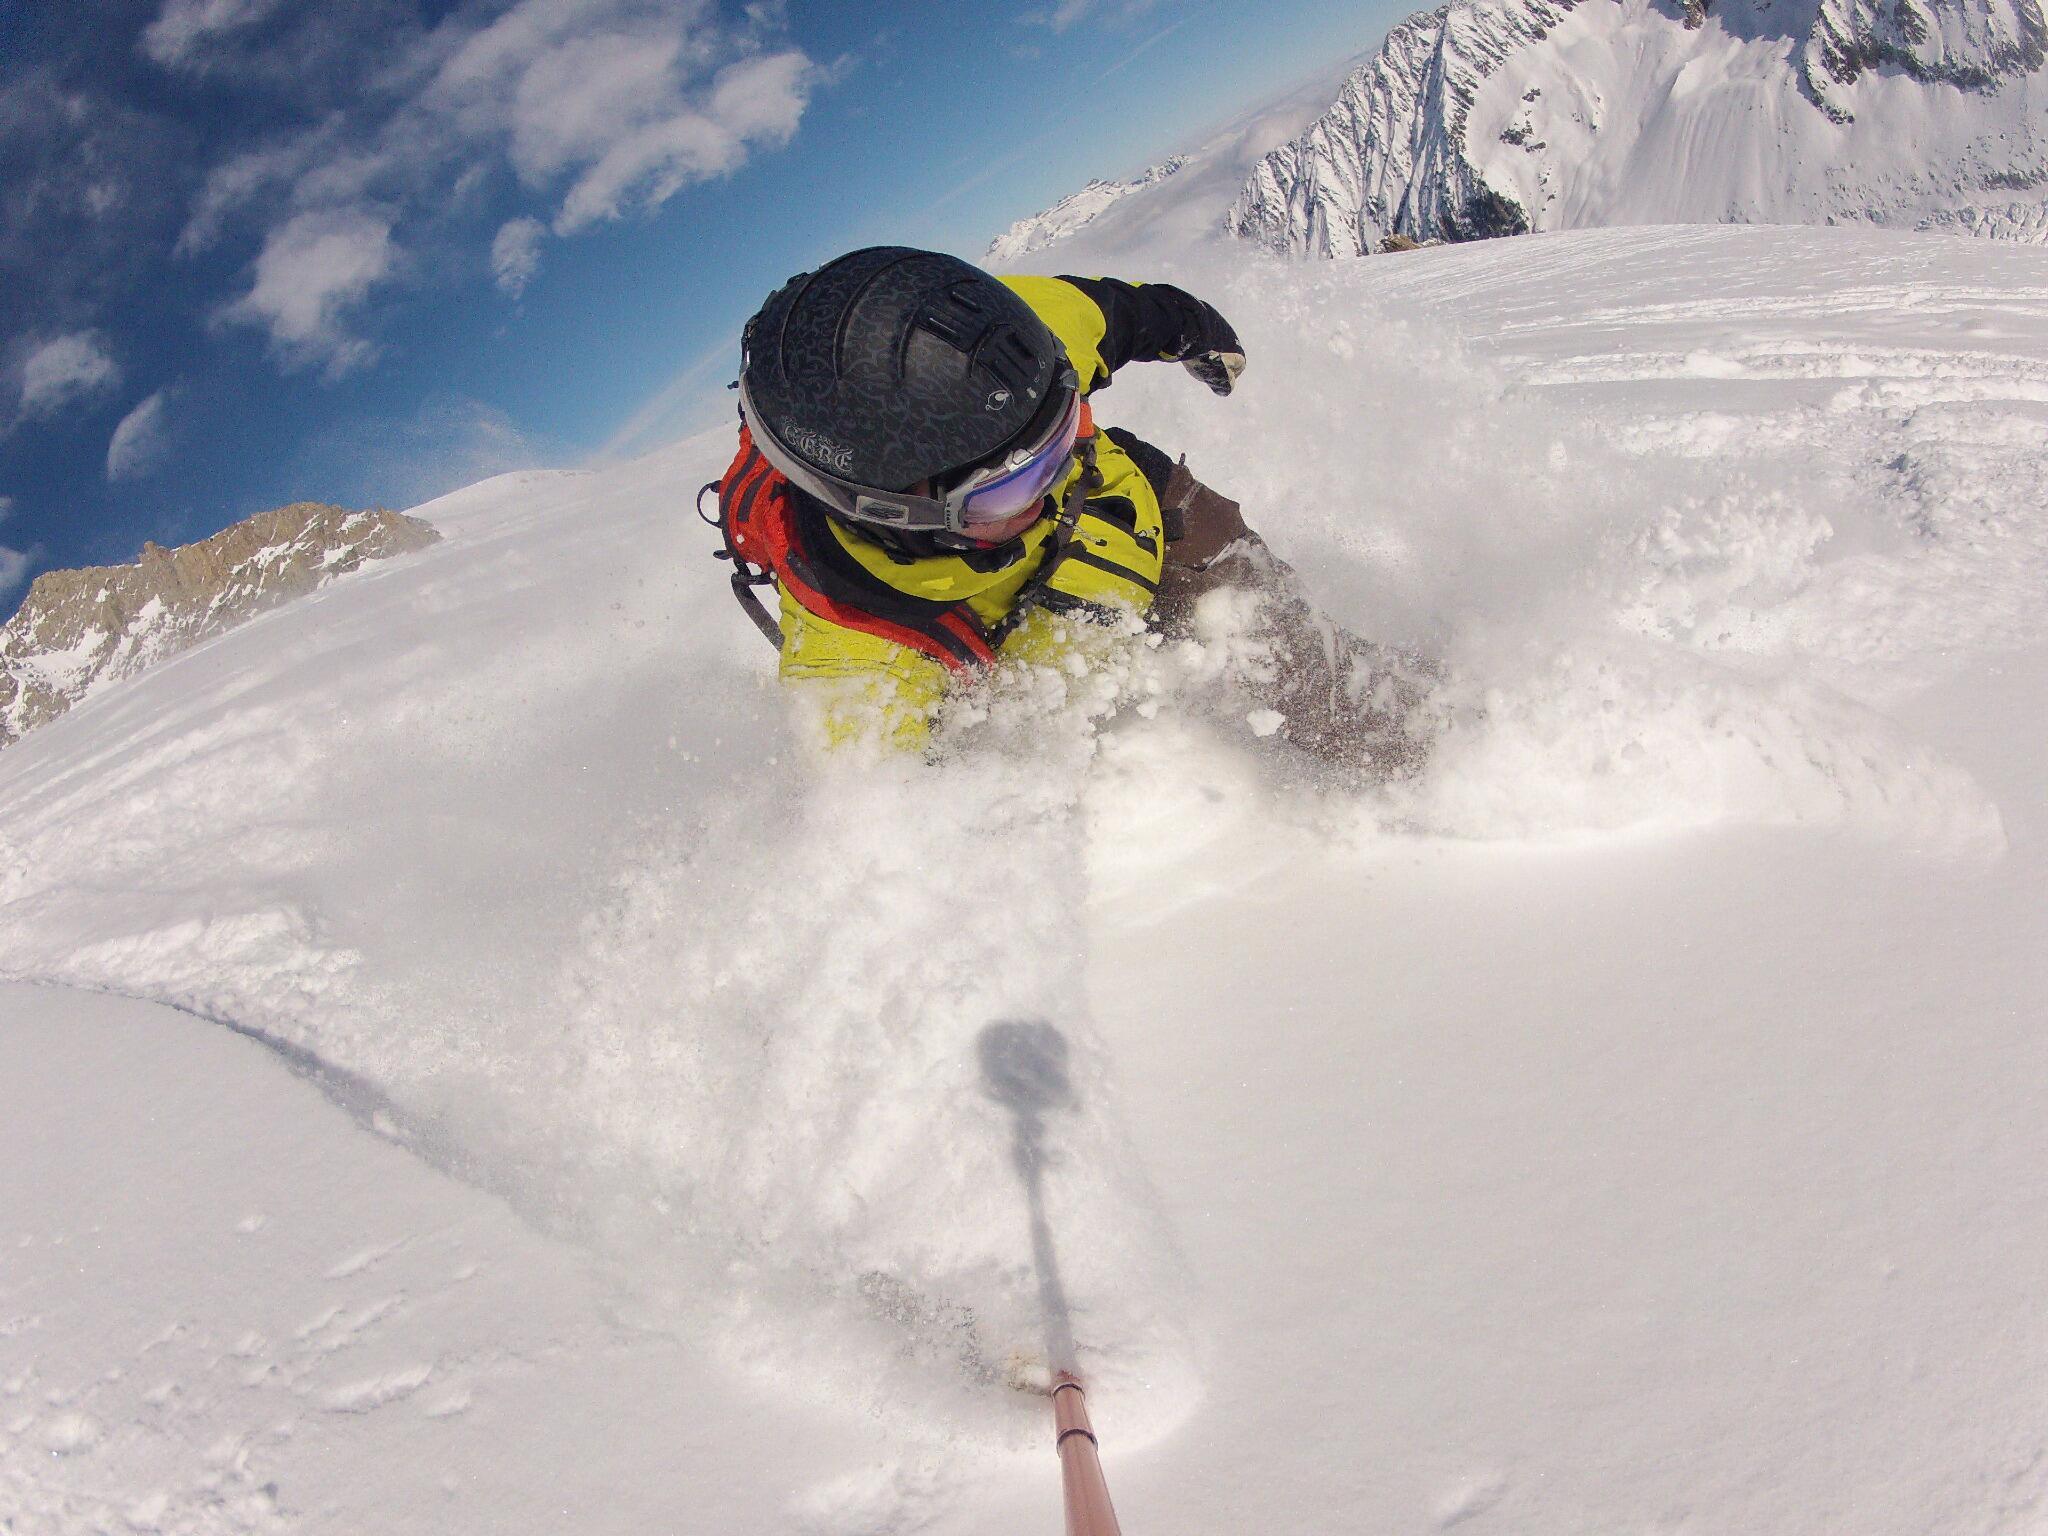 Shredding Chamonix powder with @pehrson73. http://t.co/V5MPhWYjtw